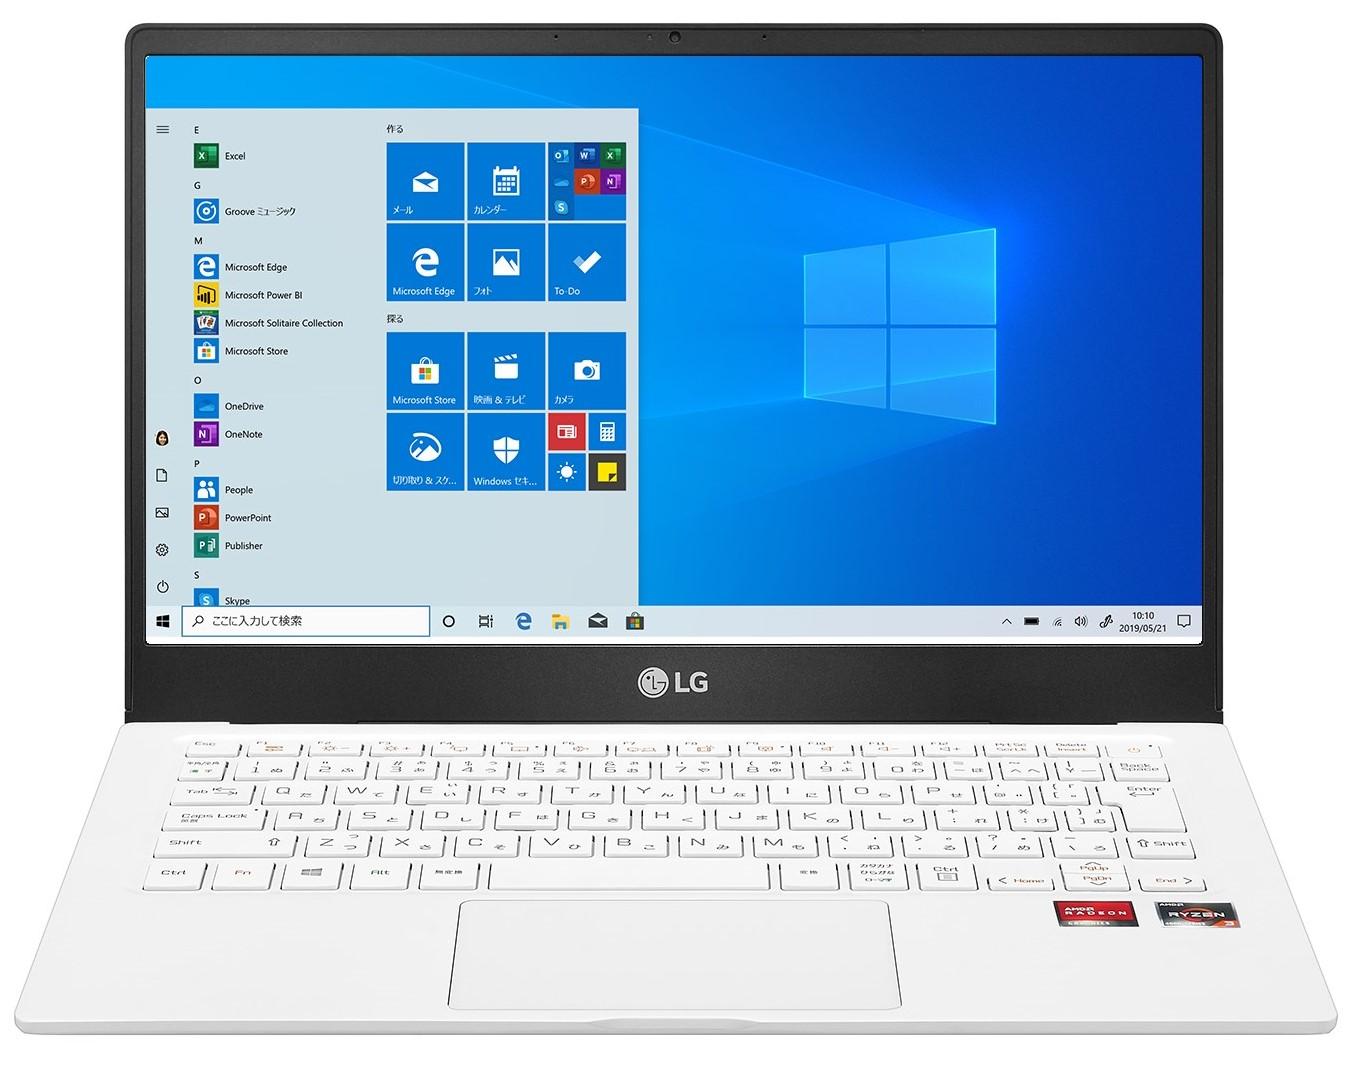 LGのノートパソコンに新シリーズ登場! AMD Ryzen(TM) プロセッサー搭載の『LG UltraPC』全4モデルを2月2日(火) より全国で順次発売